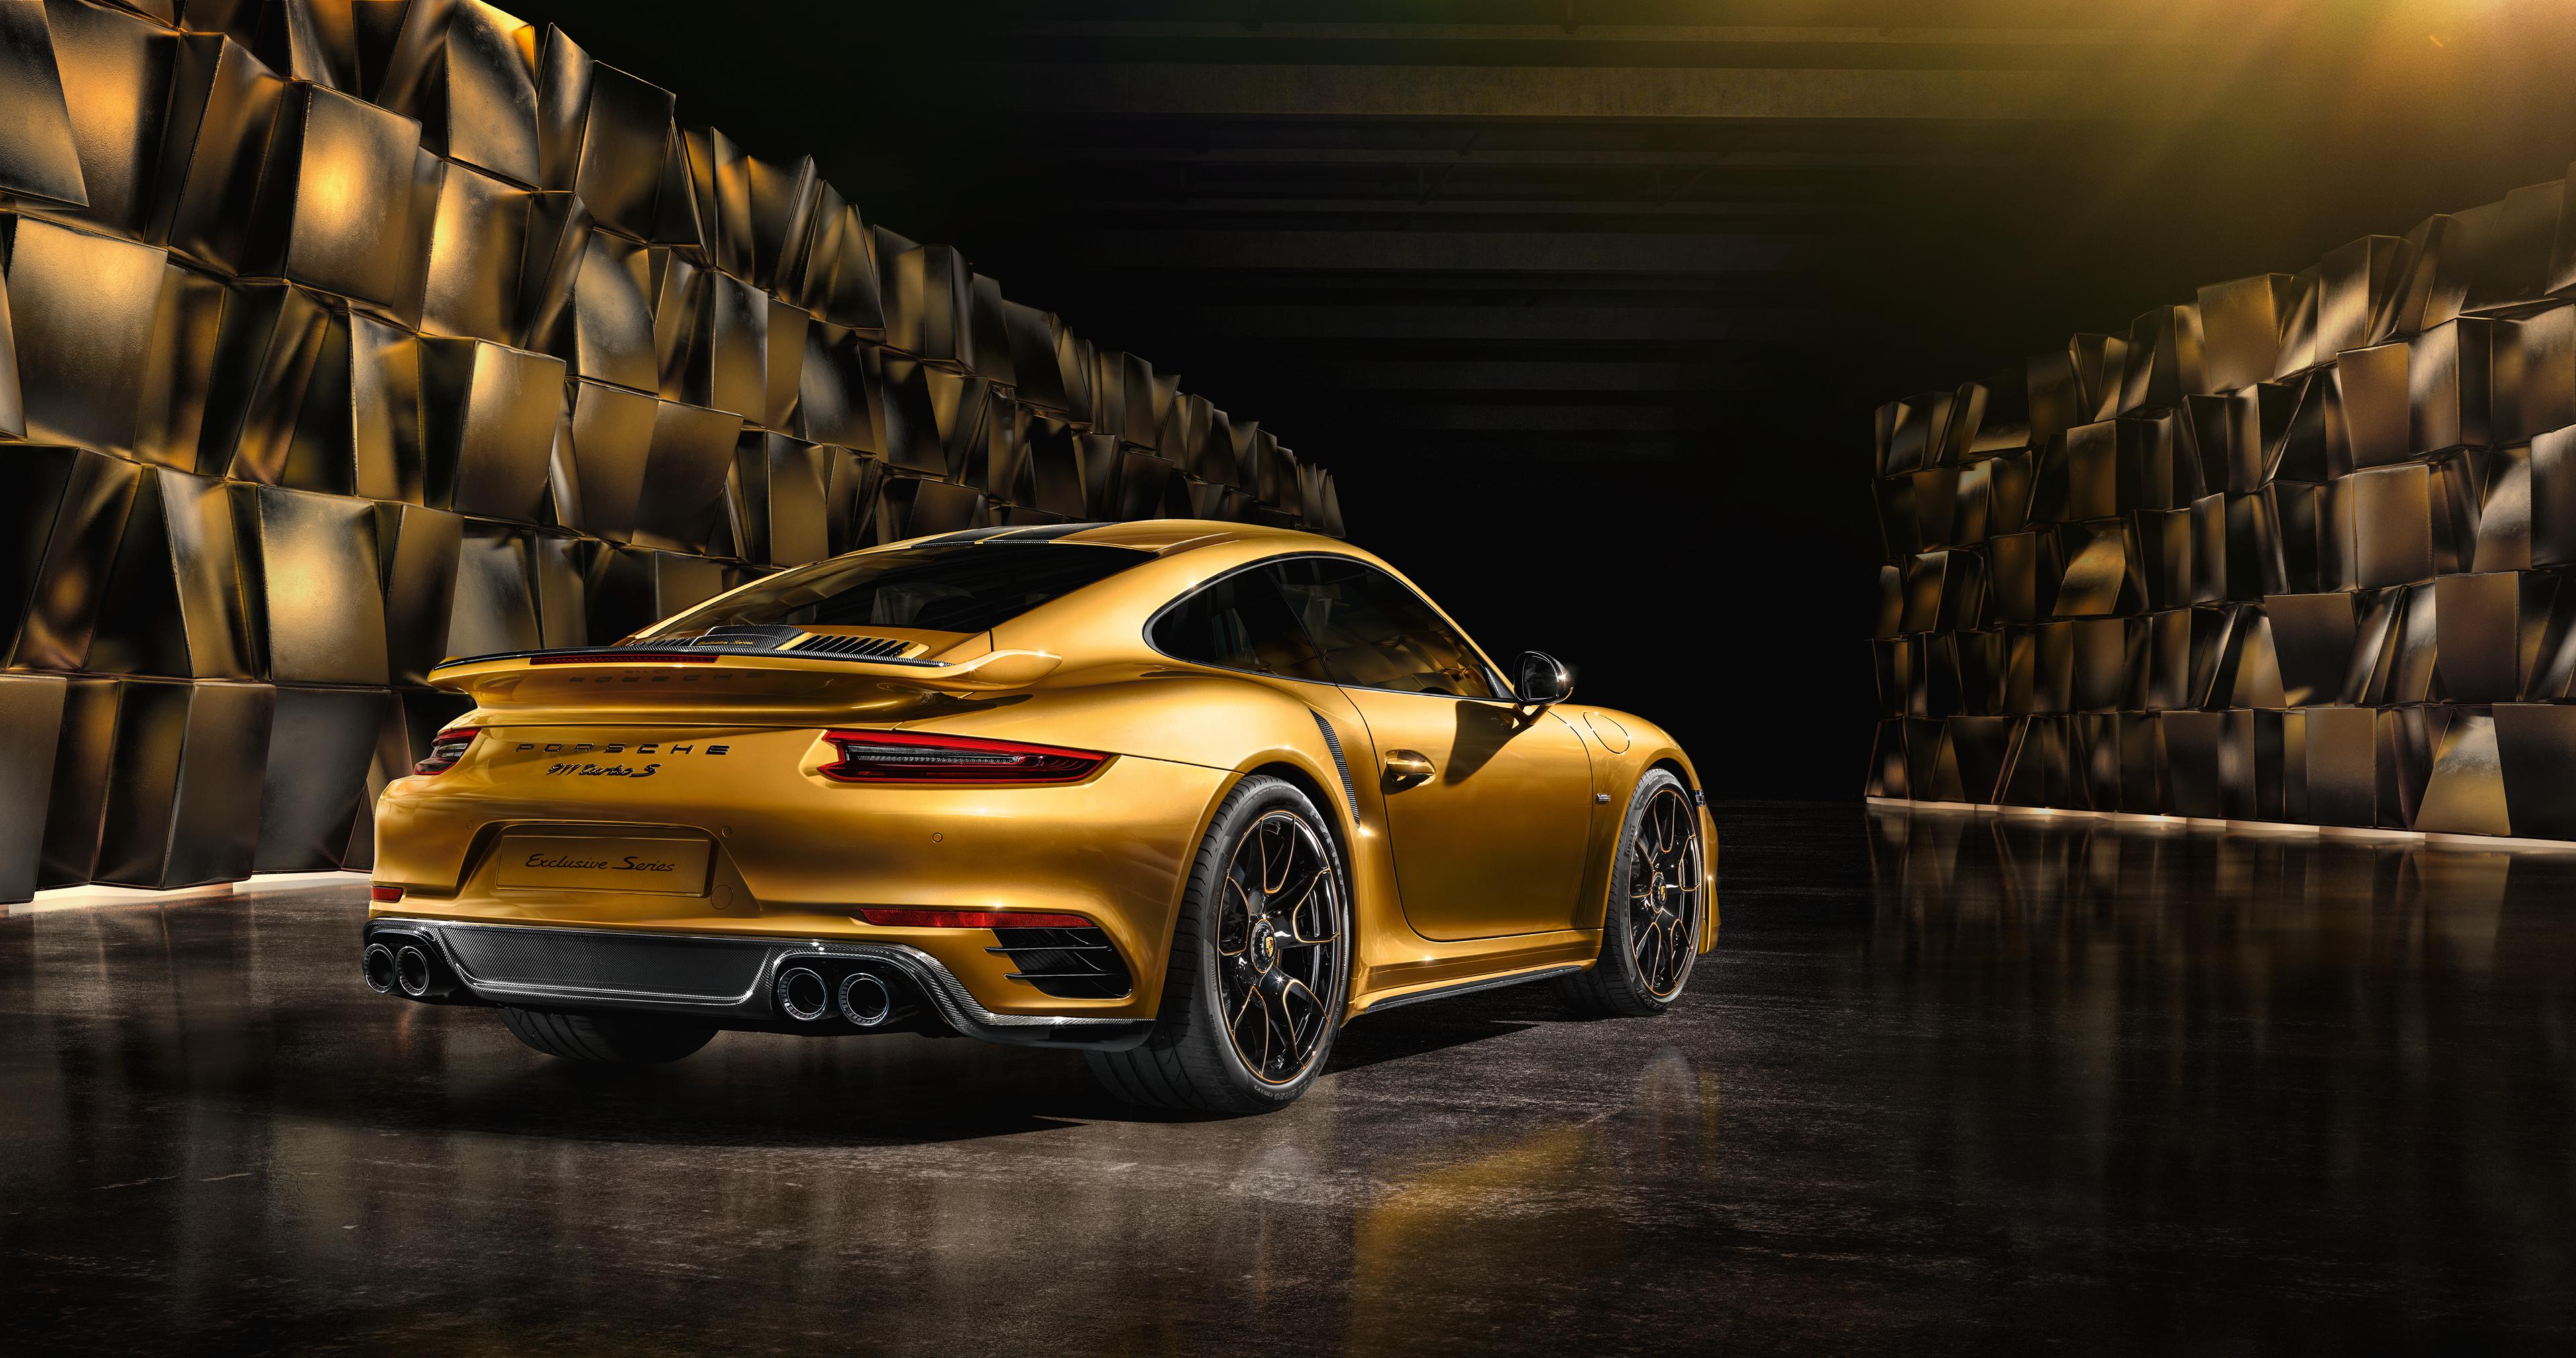 Porsche 991 Ii Turbo 4k Hd Cars 4k Wallpapers Images